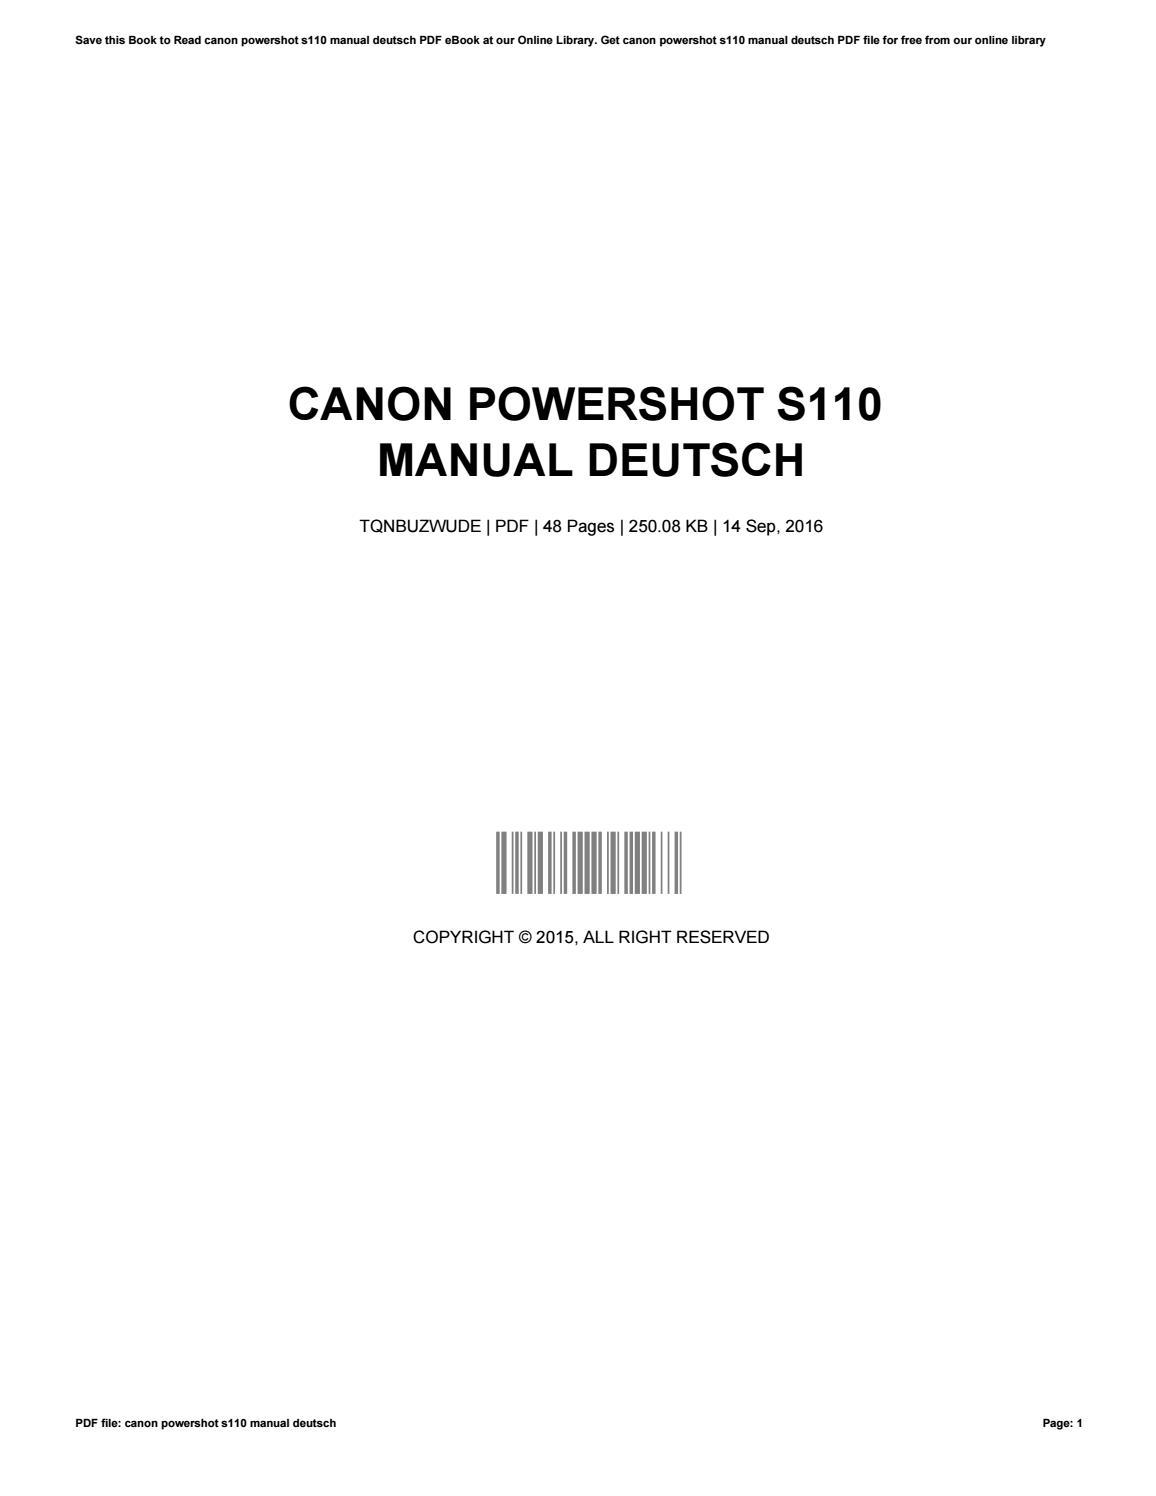 ... Array - canon powershot s110 manual deutsch by juliacoleman4137 issuu  rh issuu ...